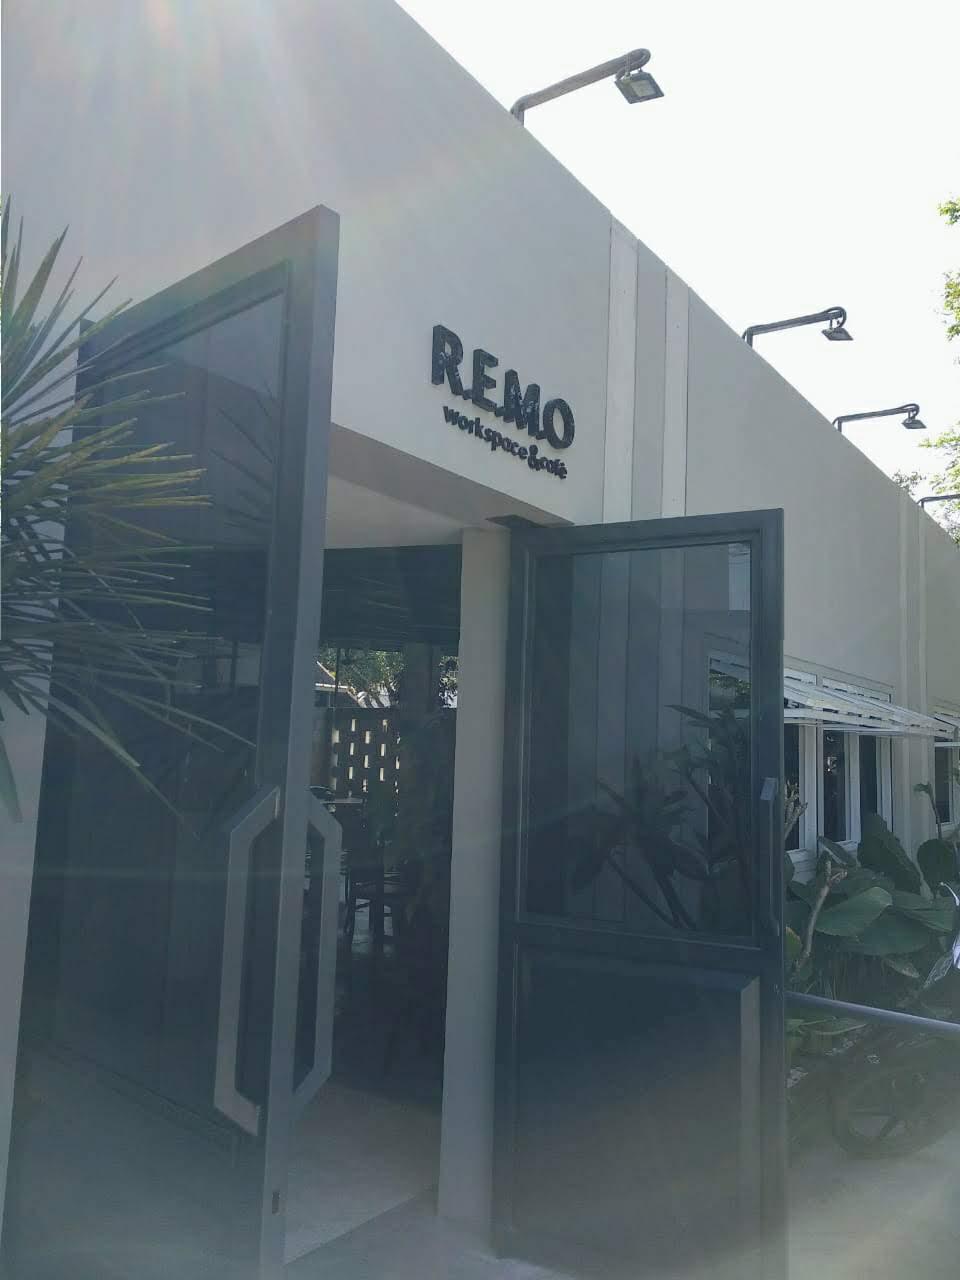 R E M O Work Space And Cafe Szasa Diandra